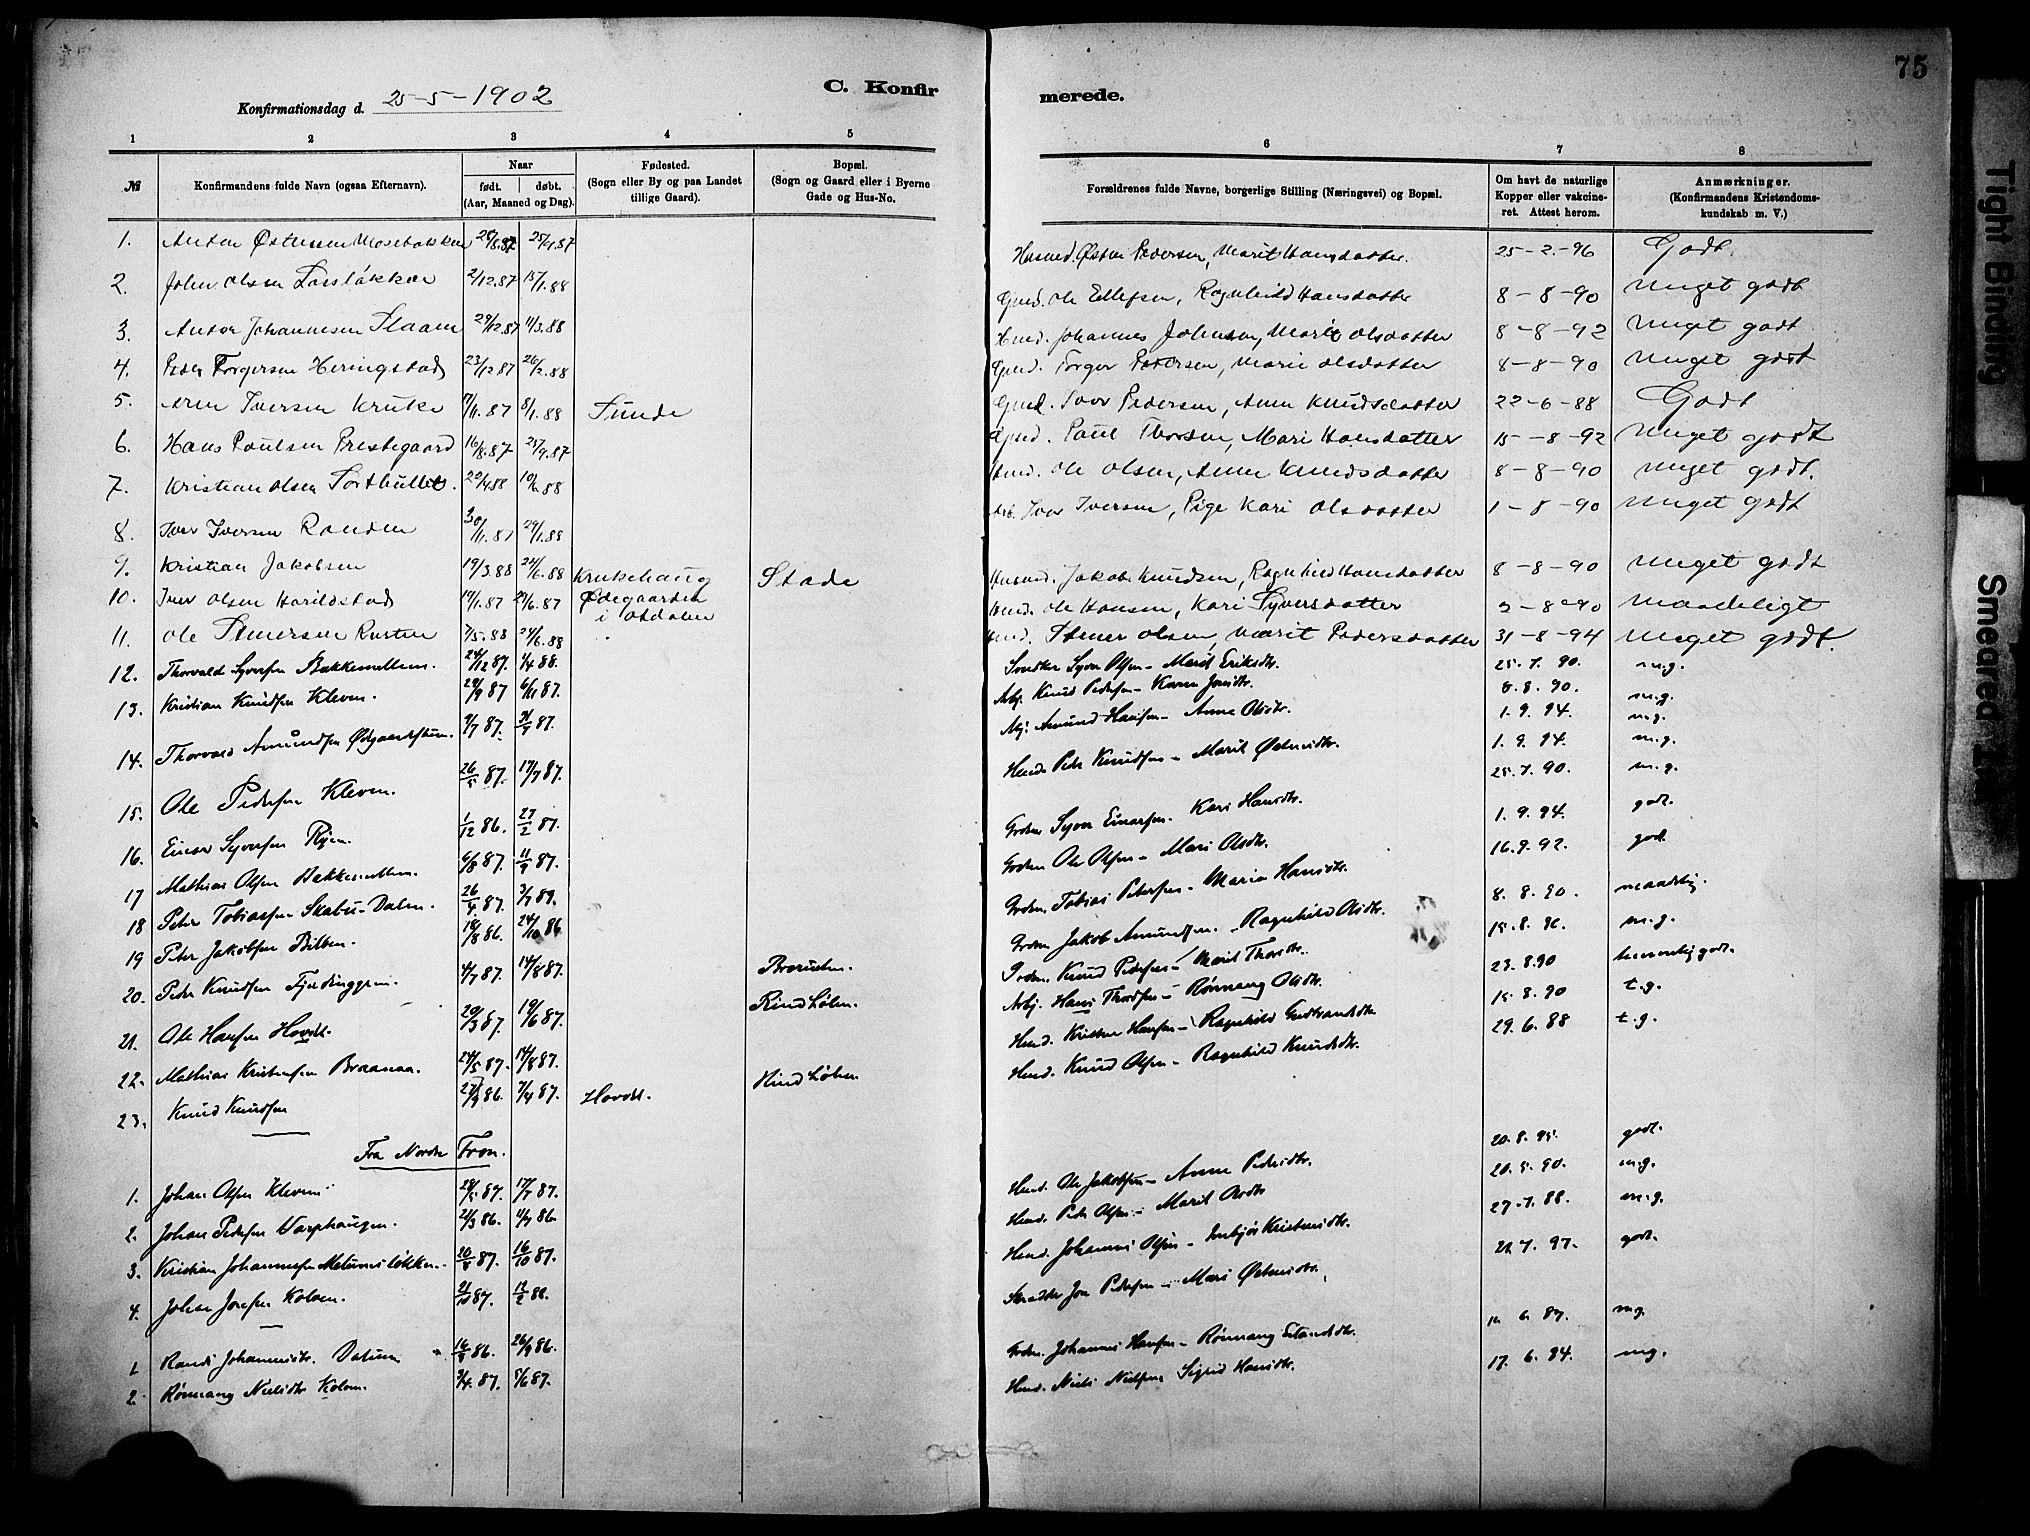 SAH, Vågå prestekontor, Ministerialbok nr. 10, 1887-1904, s. 75